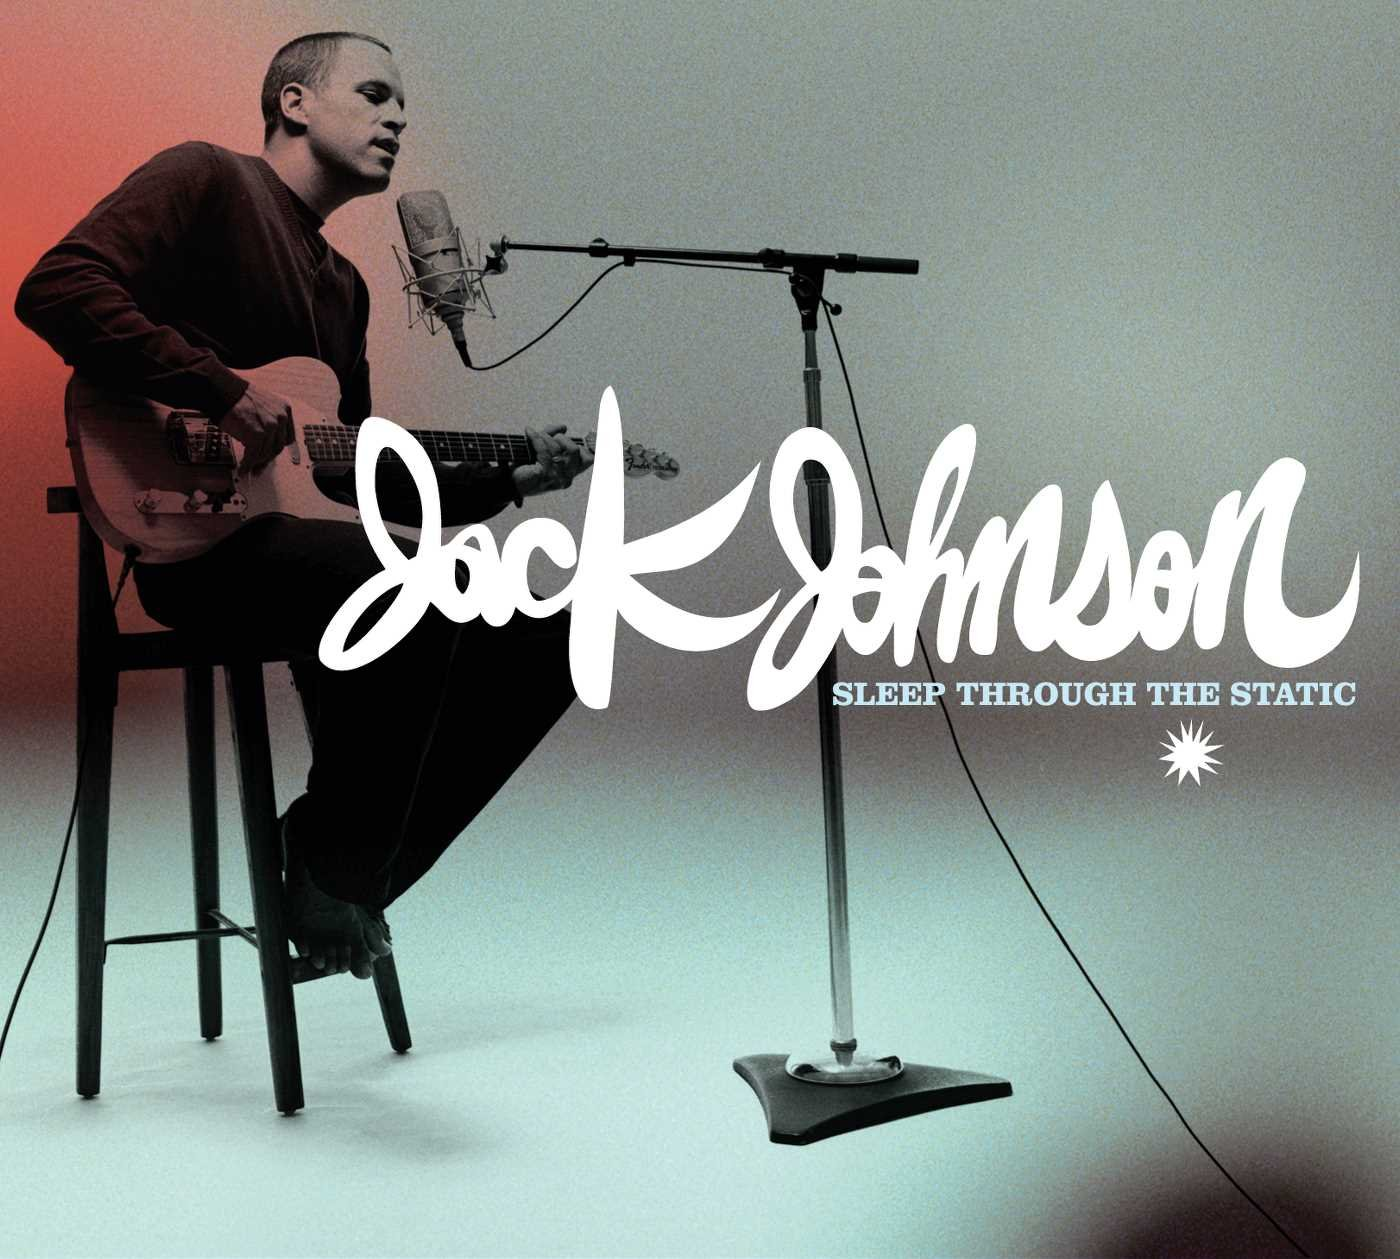 CD : Jack Johnson - Sleep Through the Static (Digipack Packaging)